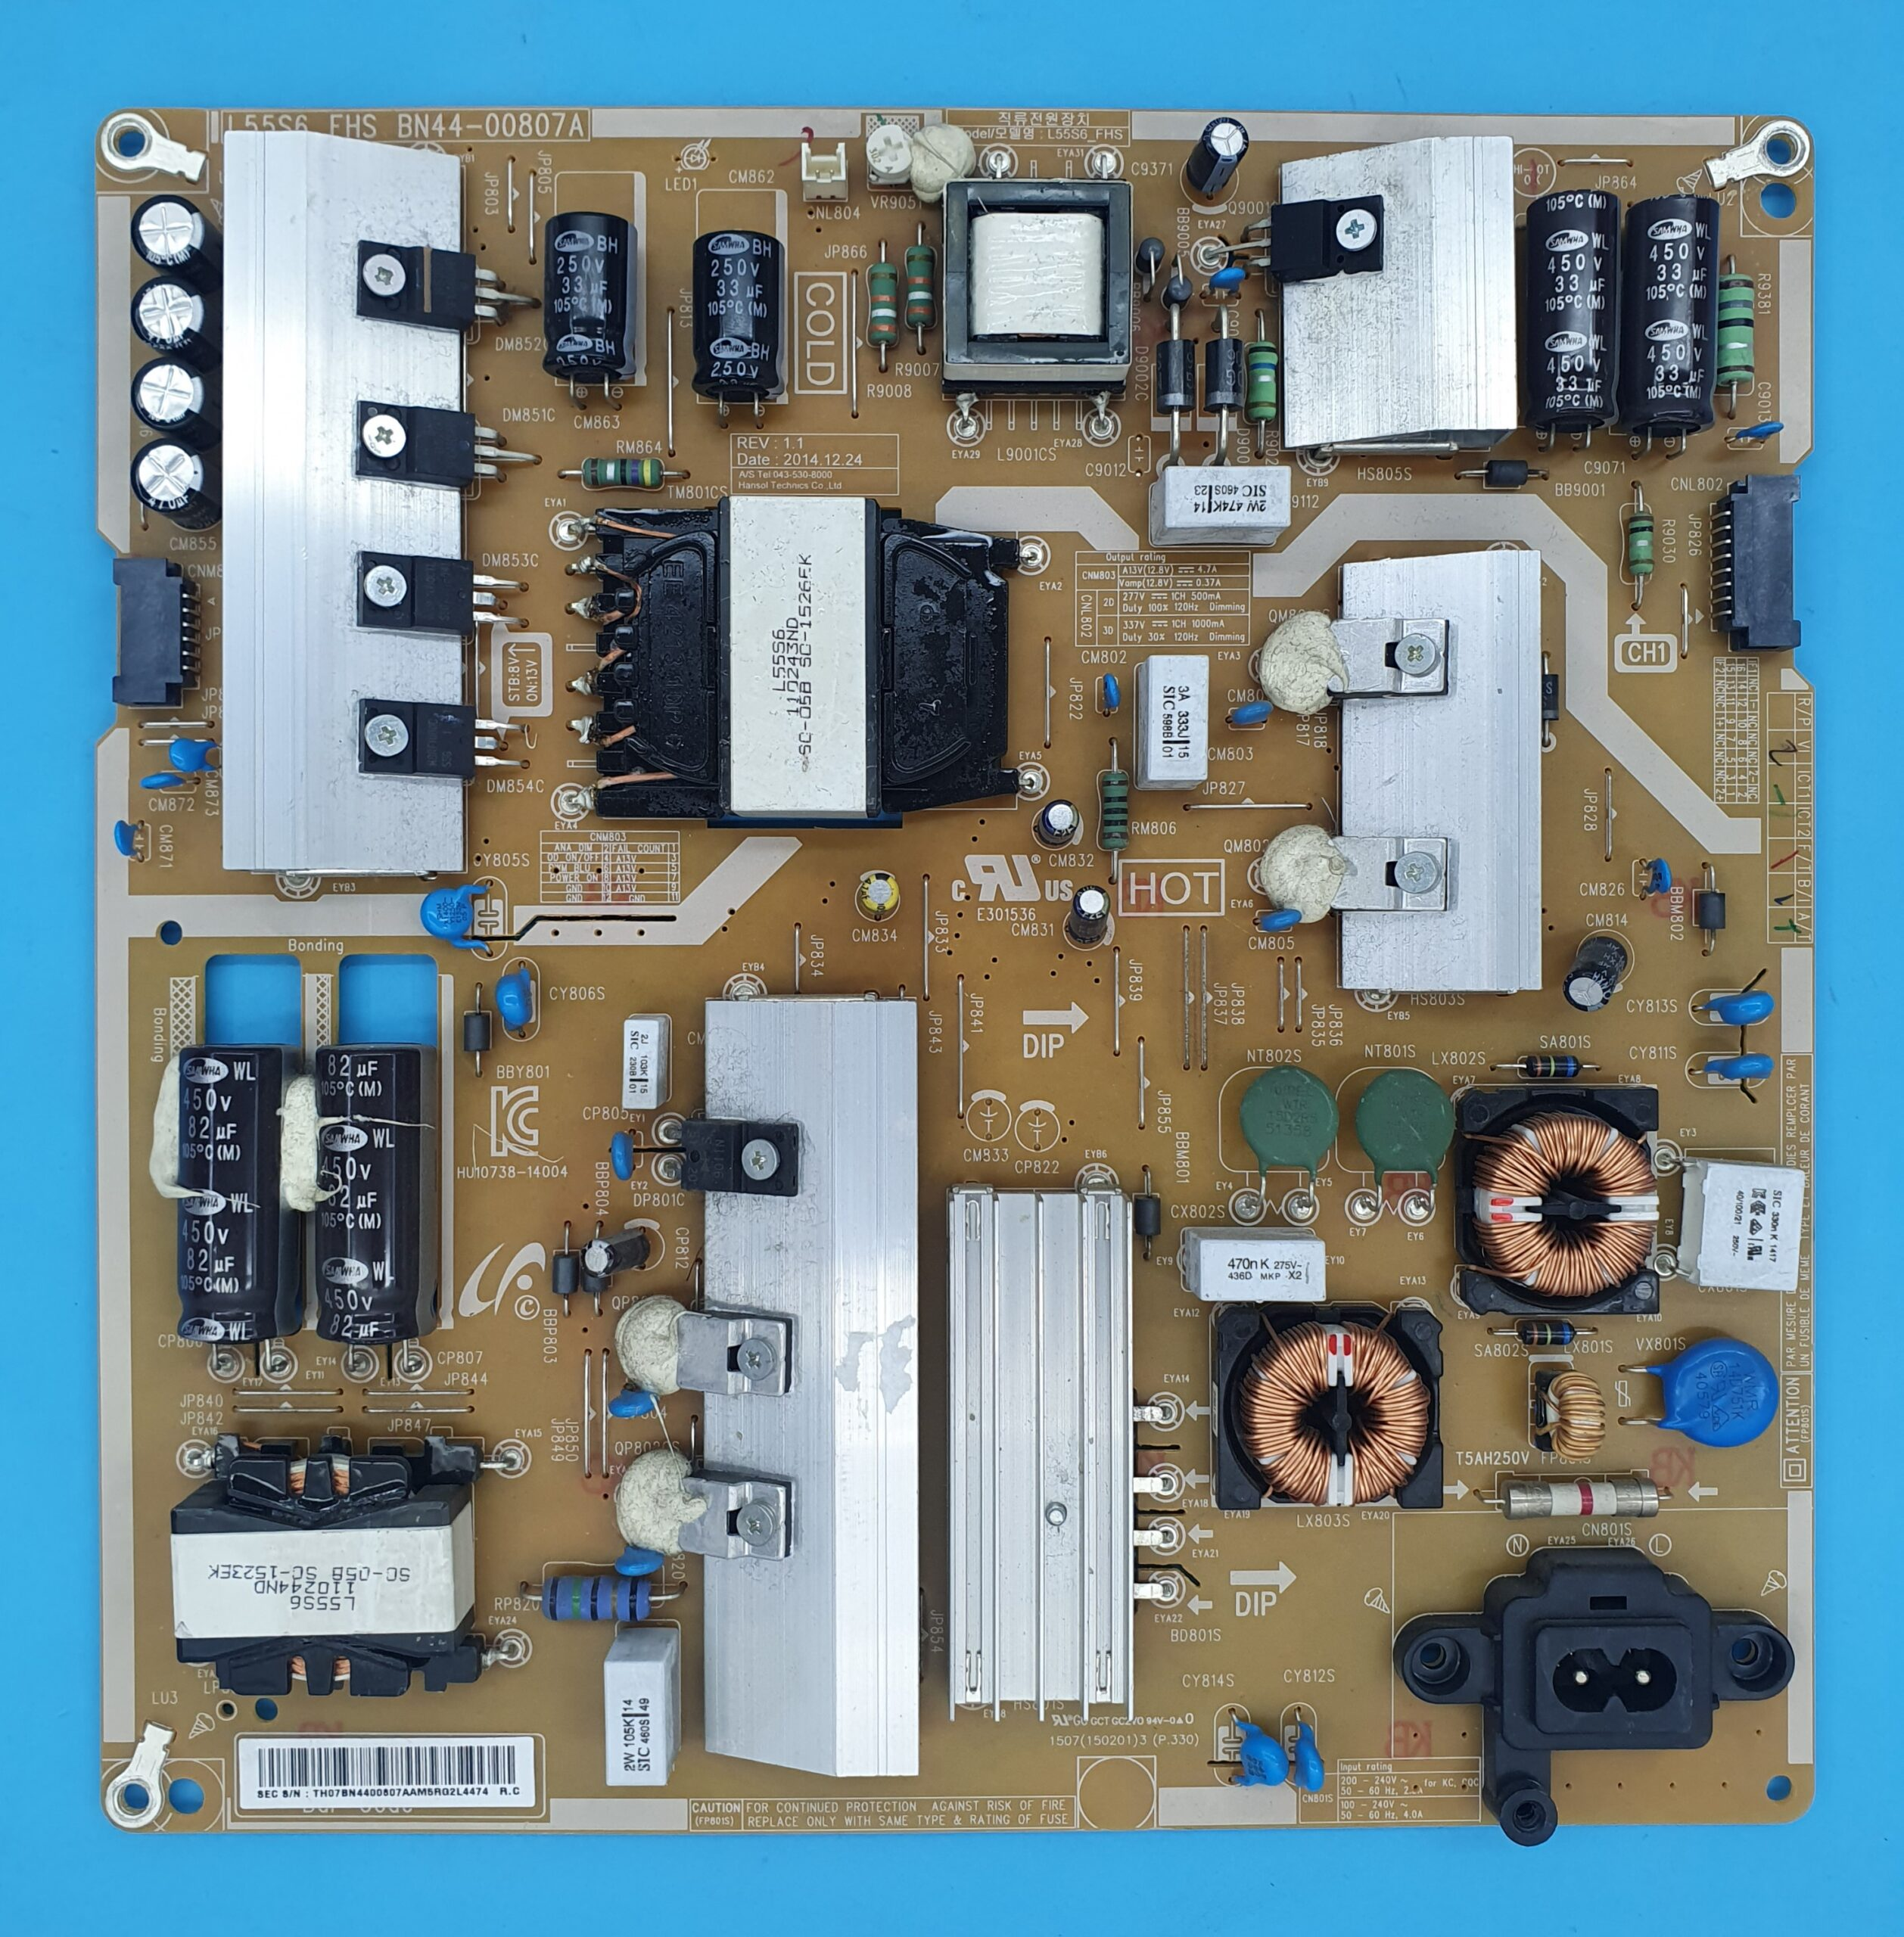 L55S6_FHS,BN44-00807A Samsung Power (KDV DAHİL = 250 TL)